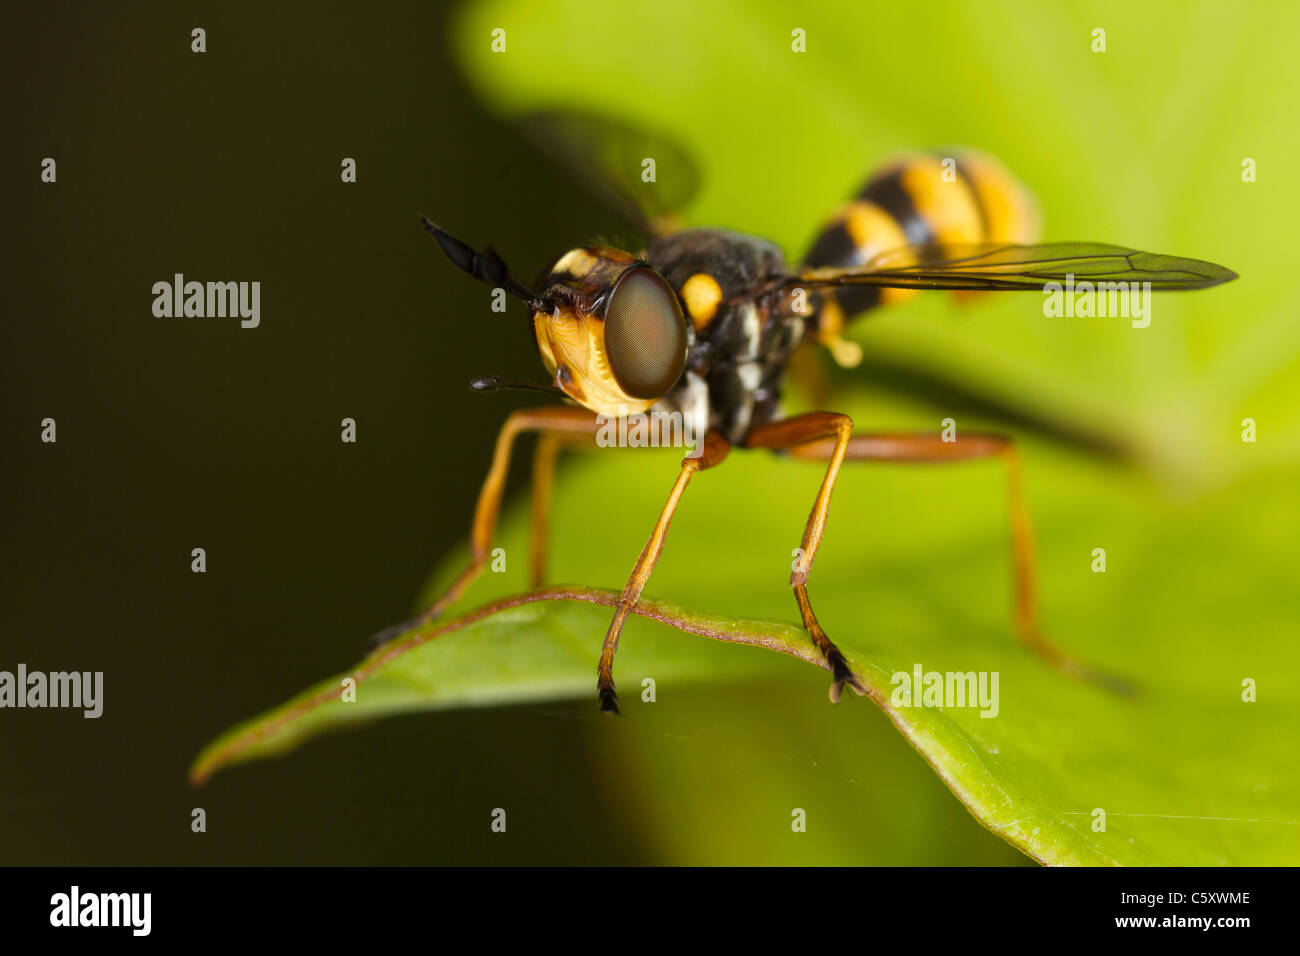 Wasp-mimic bumblebee parasite Conops quadrifasciatus sitting on a leaf - Stock Image